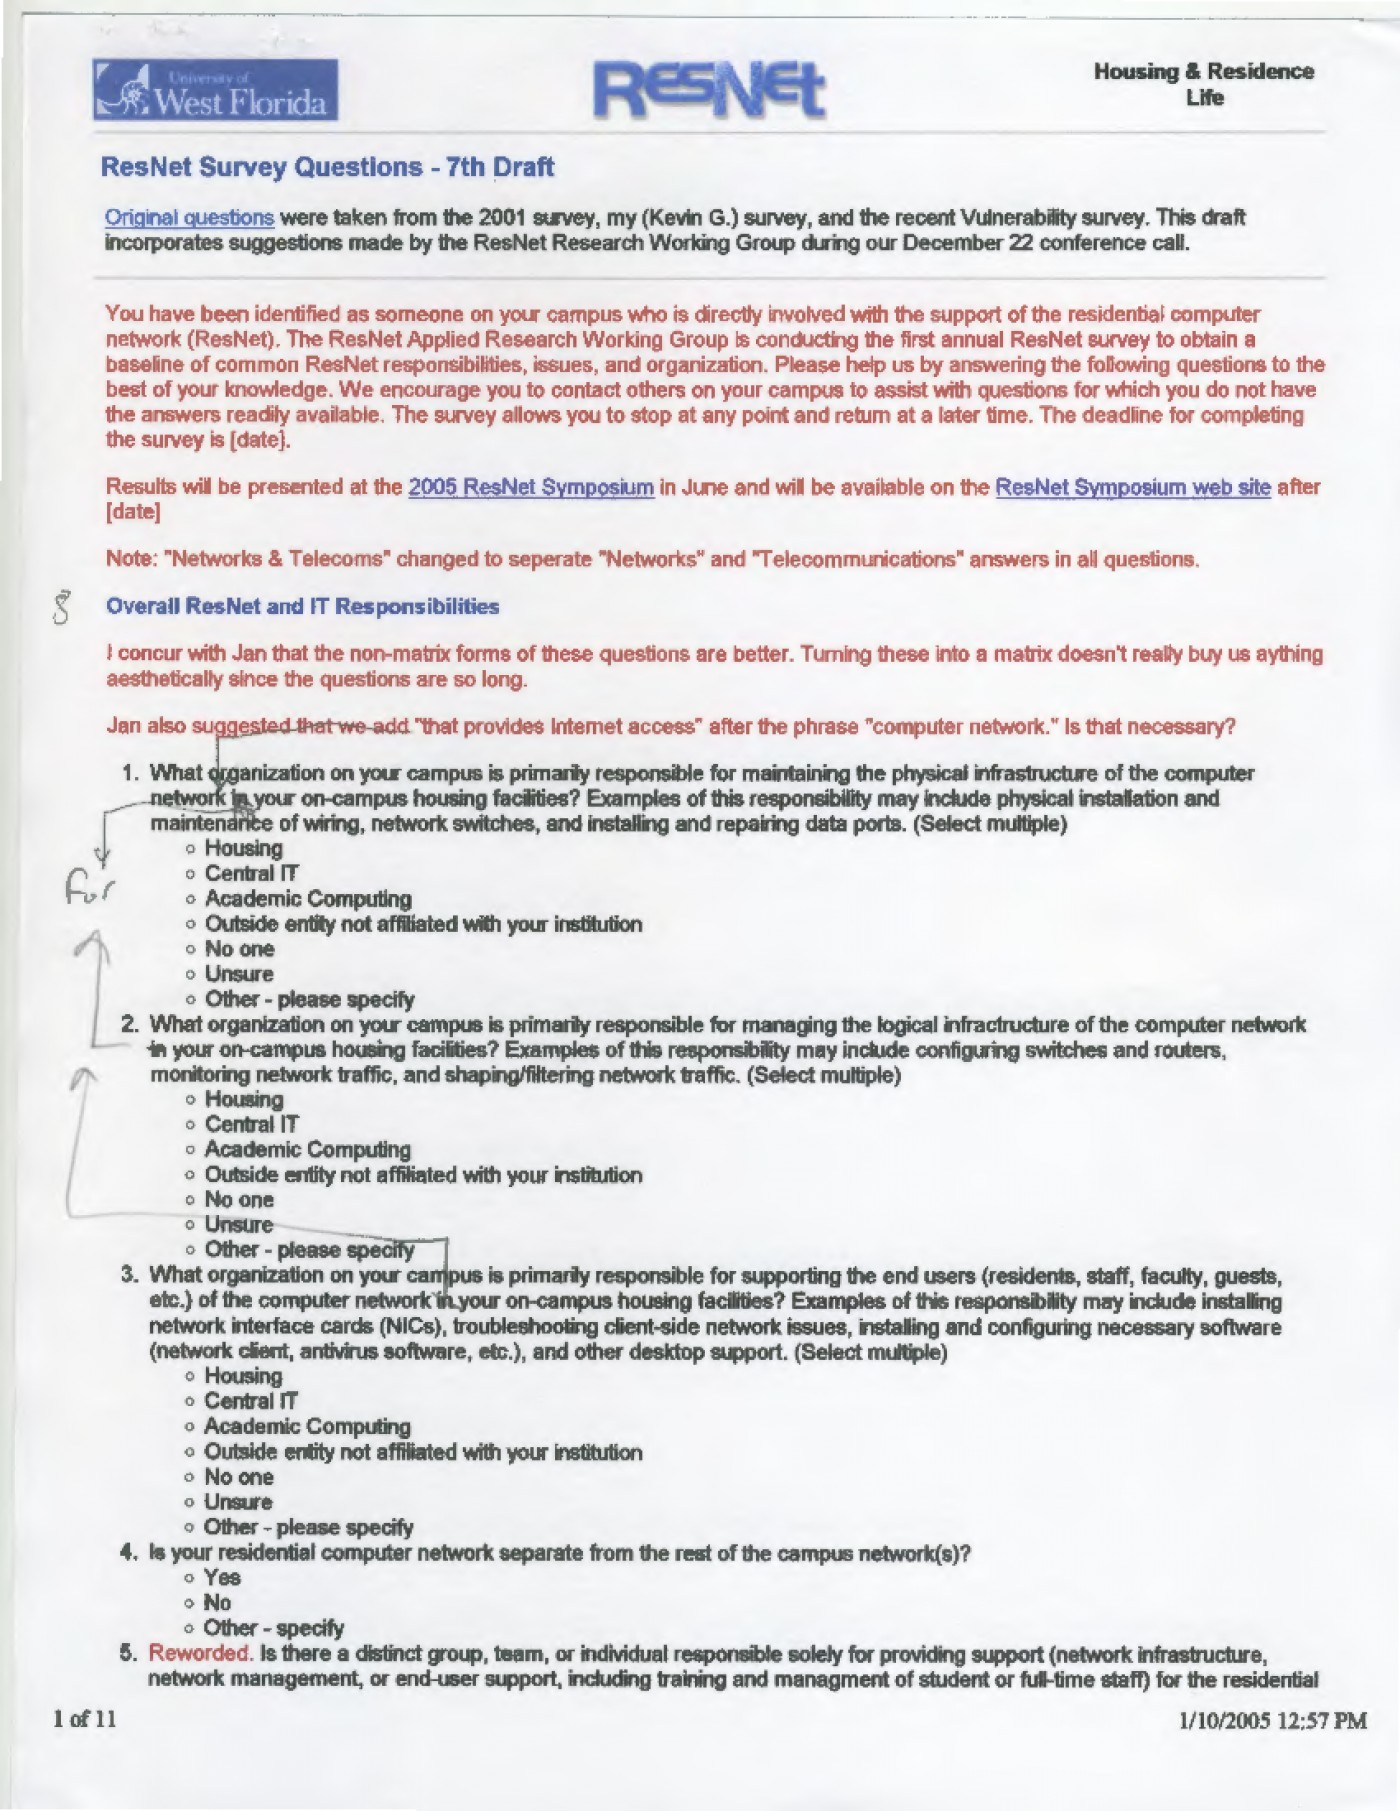 008 Essay Example Checker Free Online Originality Check Turnitin Macquarie College Resnet Survey Draft Amazing Sentence Grammar Plagiarism Document 1400